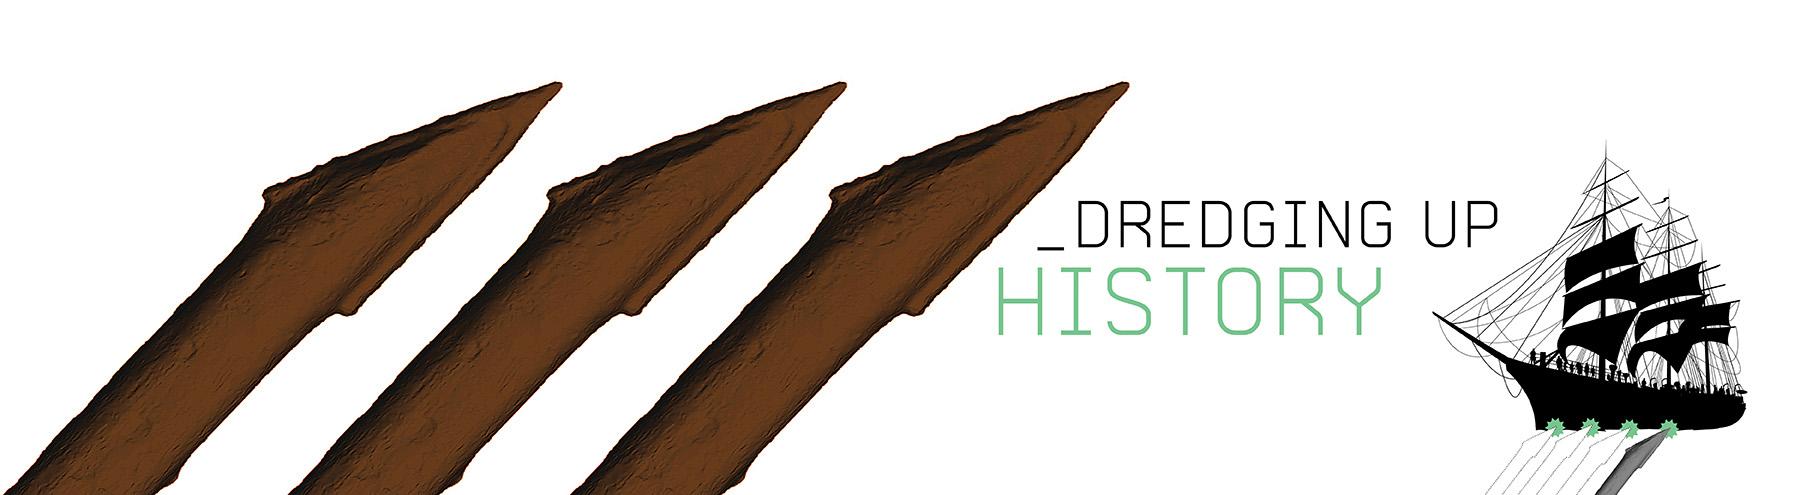 Dredging Up History